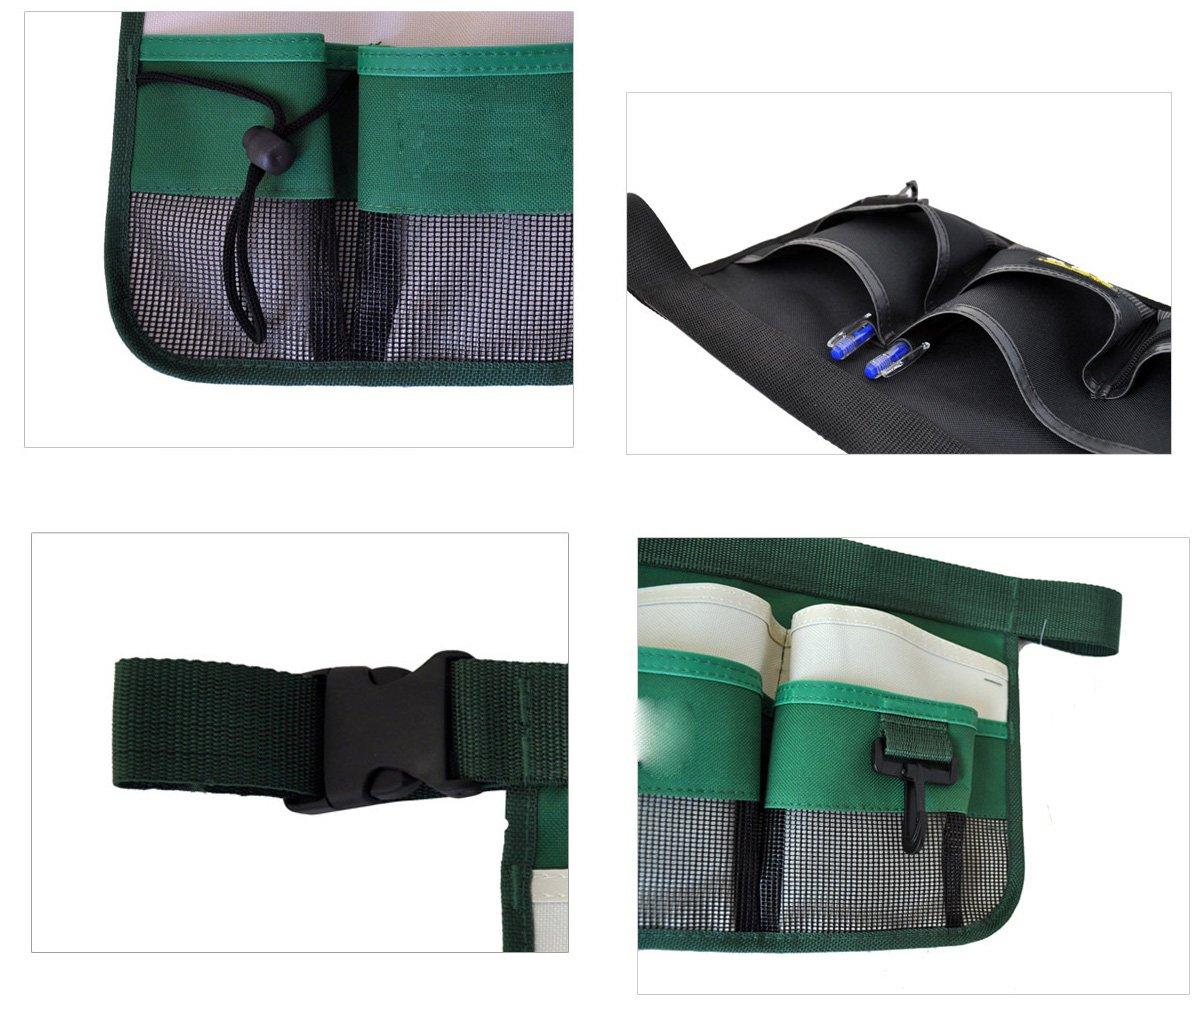 Thicken Canvas 7 Pocket Gardening Tools Belt Bags Garden Waist Bag Hanging Pouch,Green